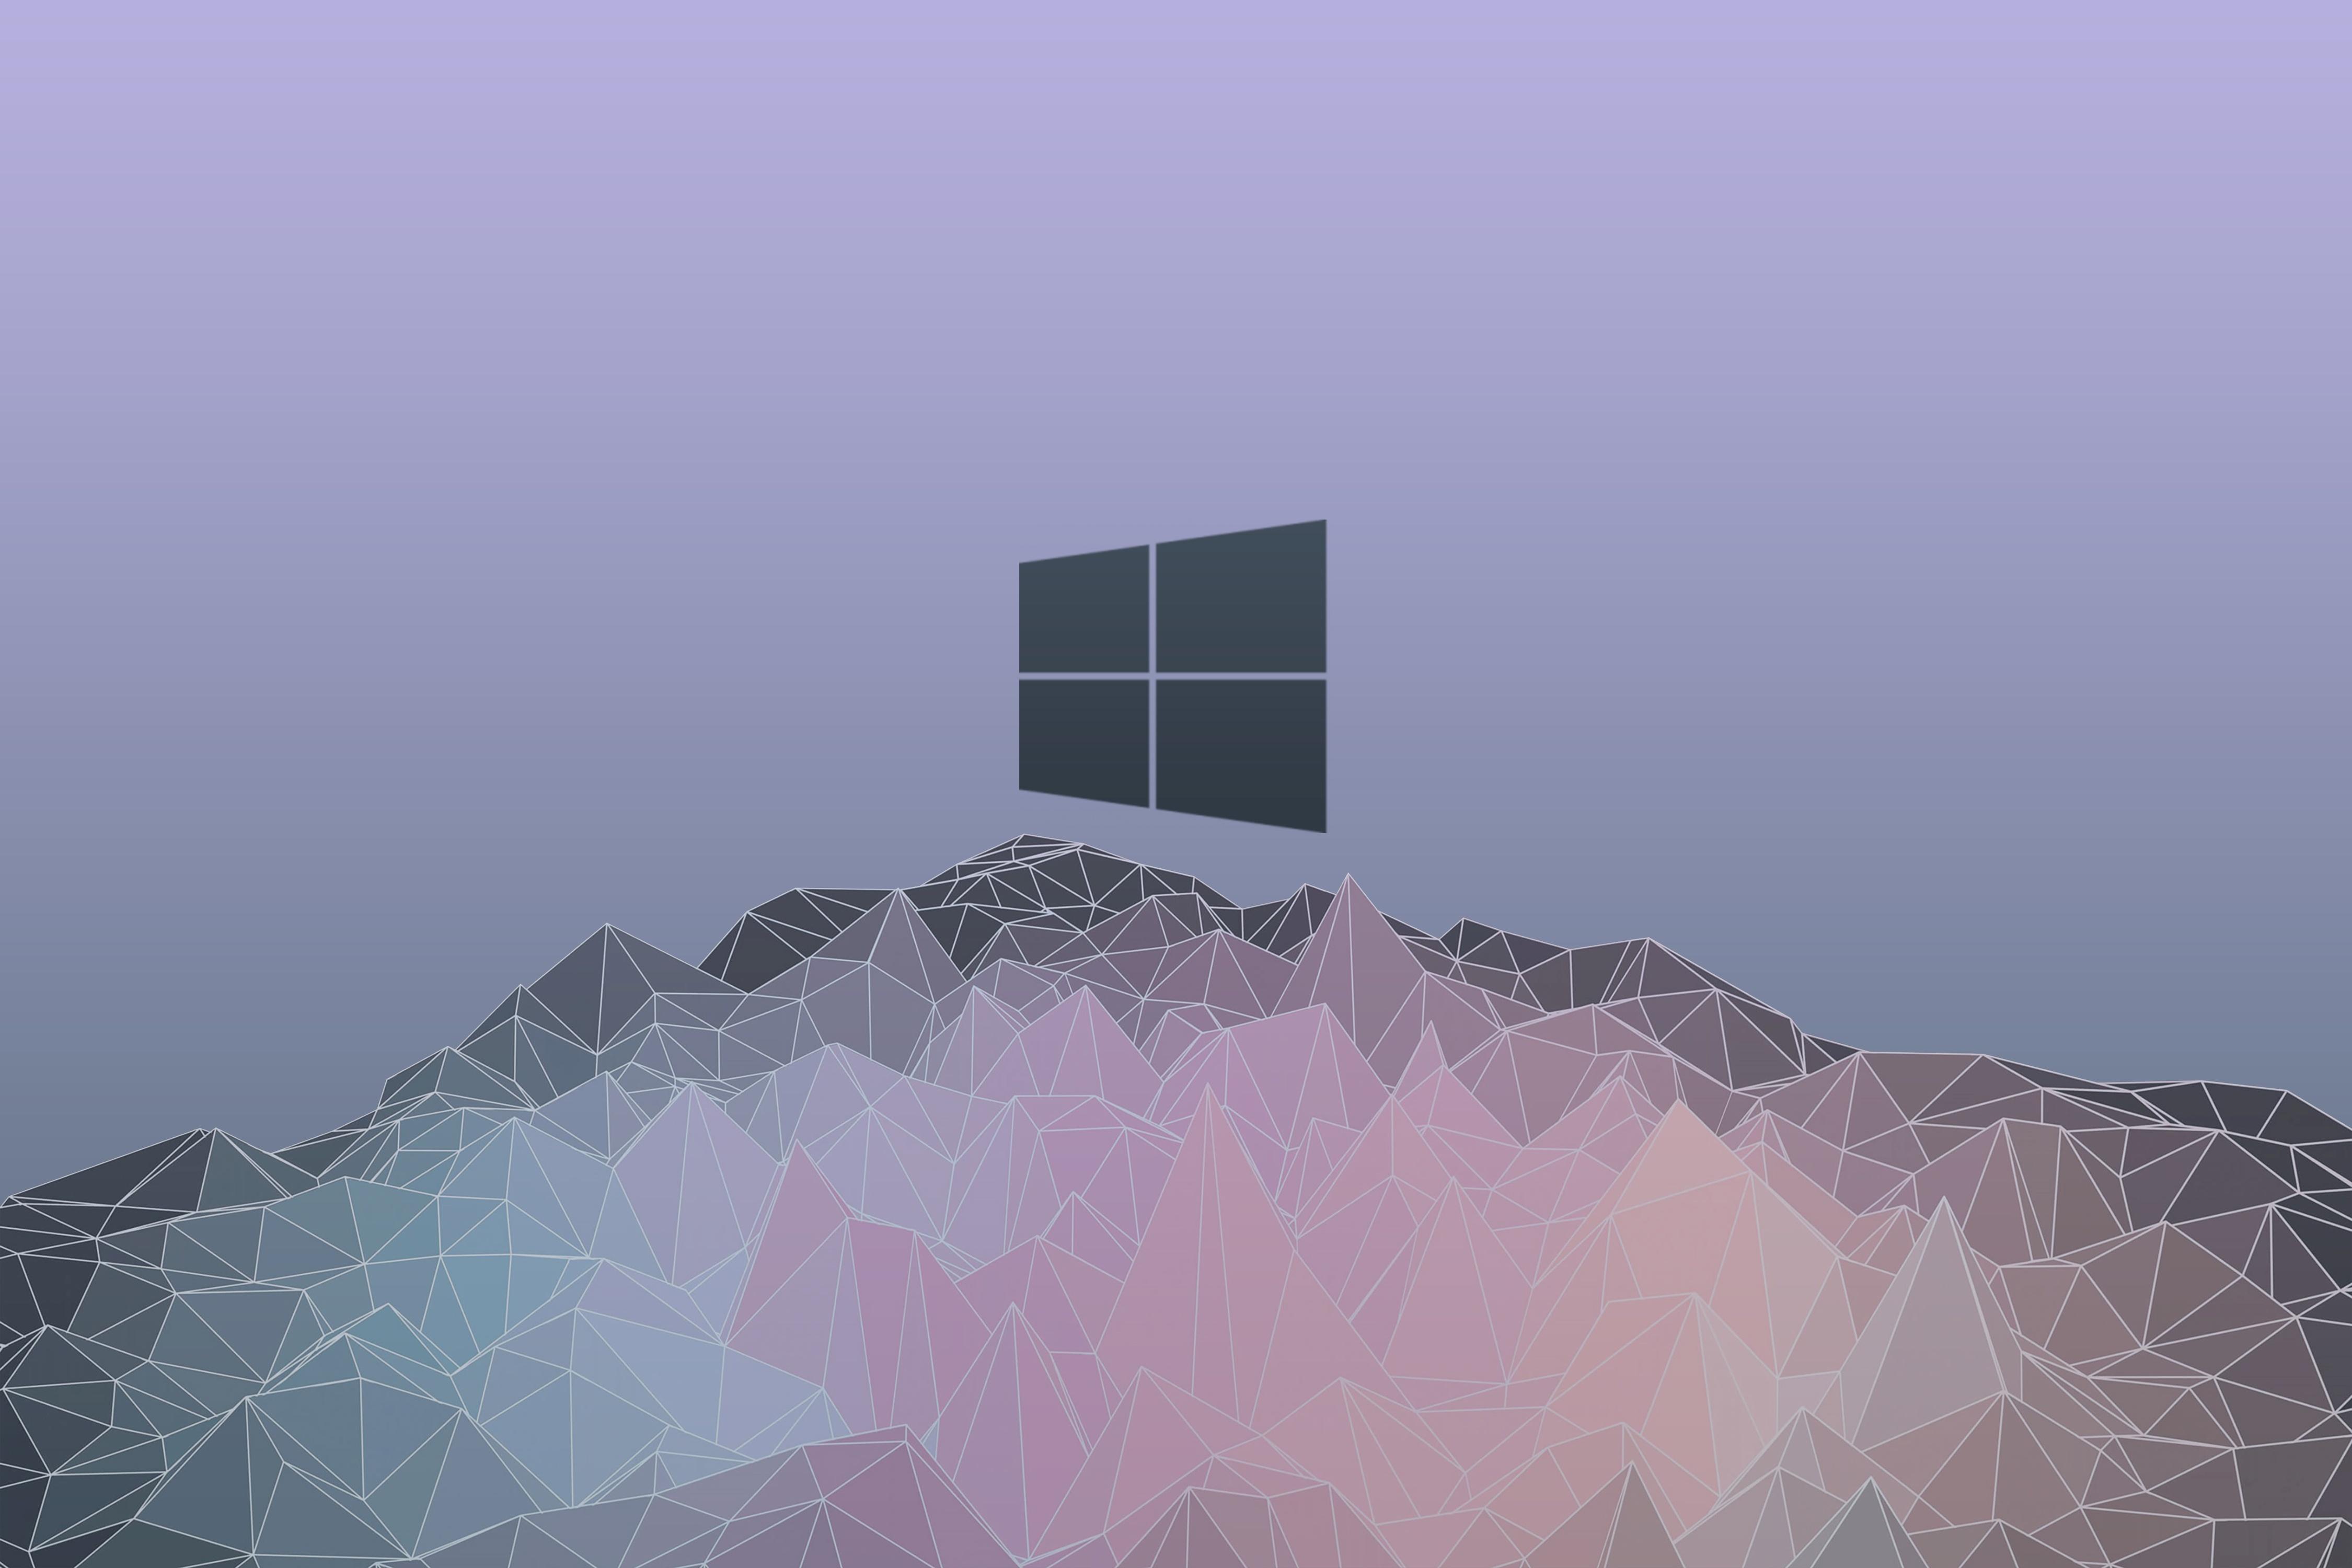 Terraforma desktop wallpaper free download